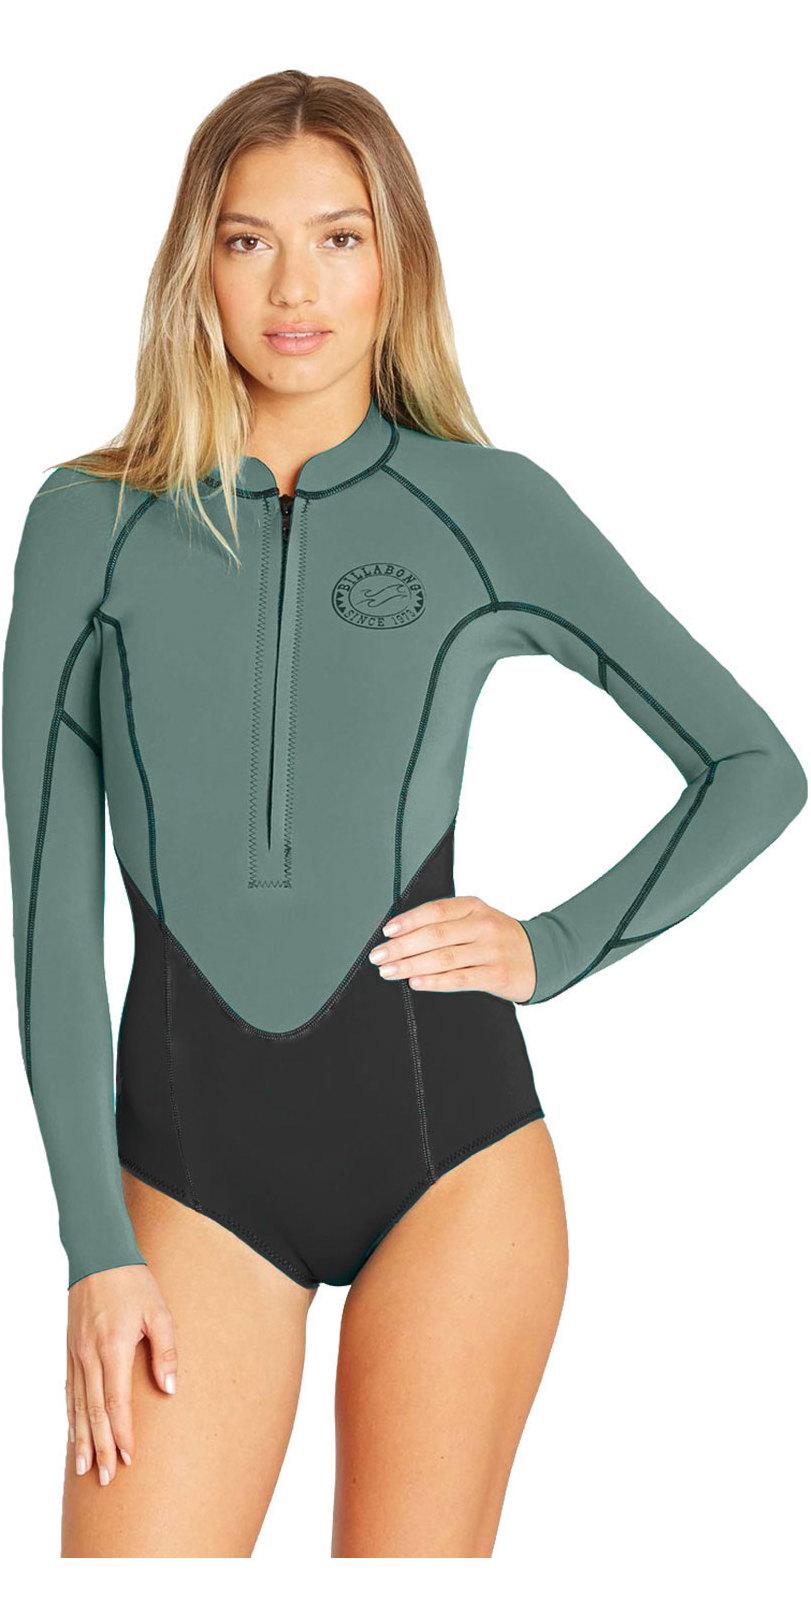 Flatlock stitch construction BILLABONG Womens Salty Dayz 2mm Front Zip Long Sleeve Shorty Wetsuit Tropical